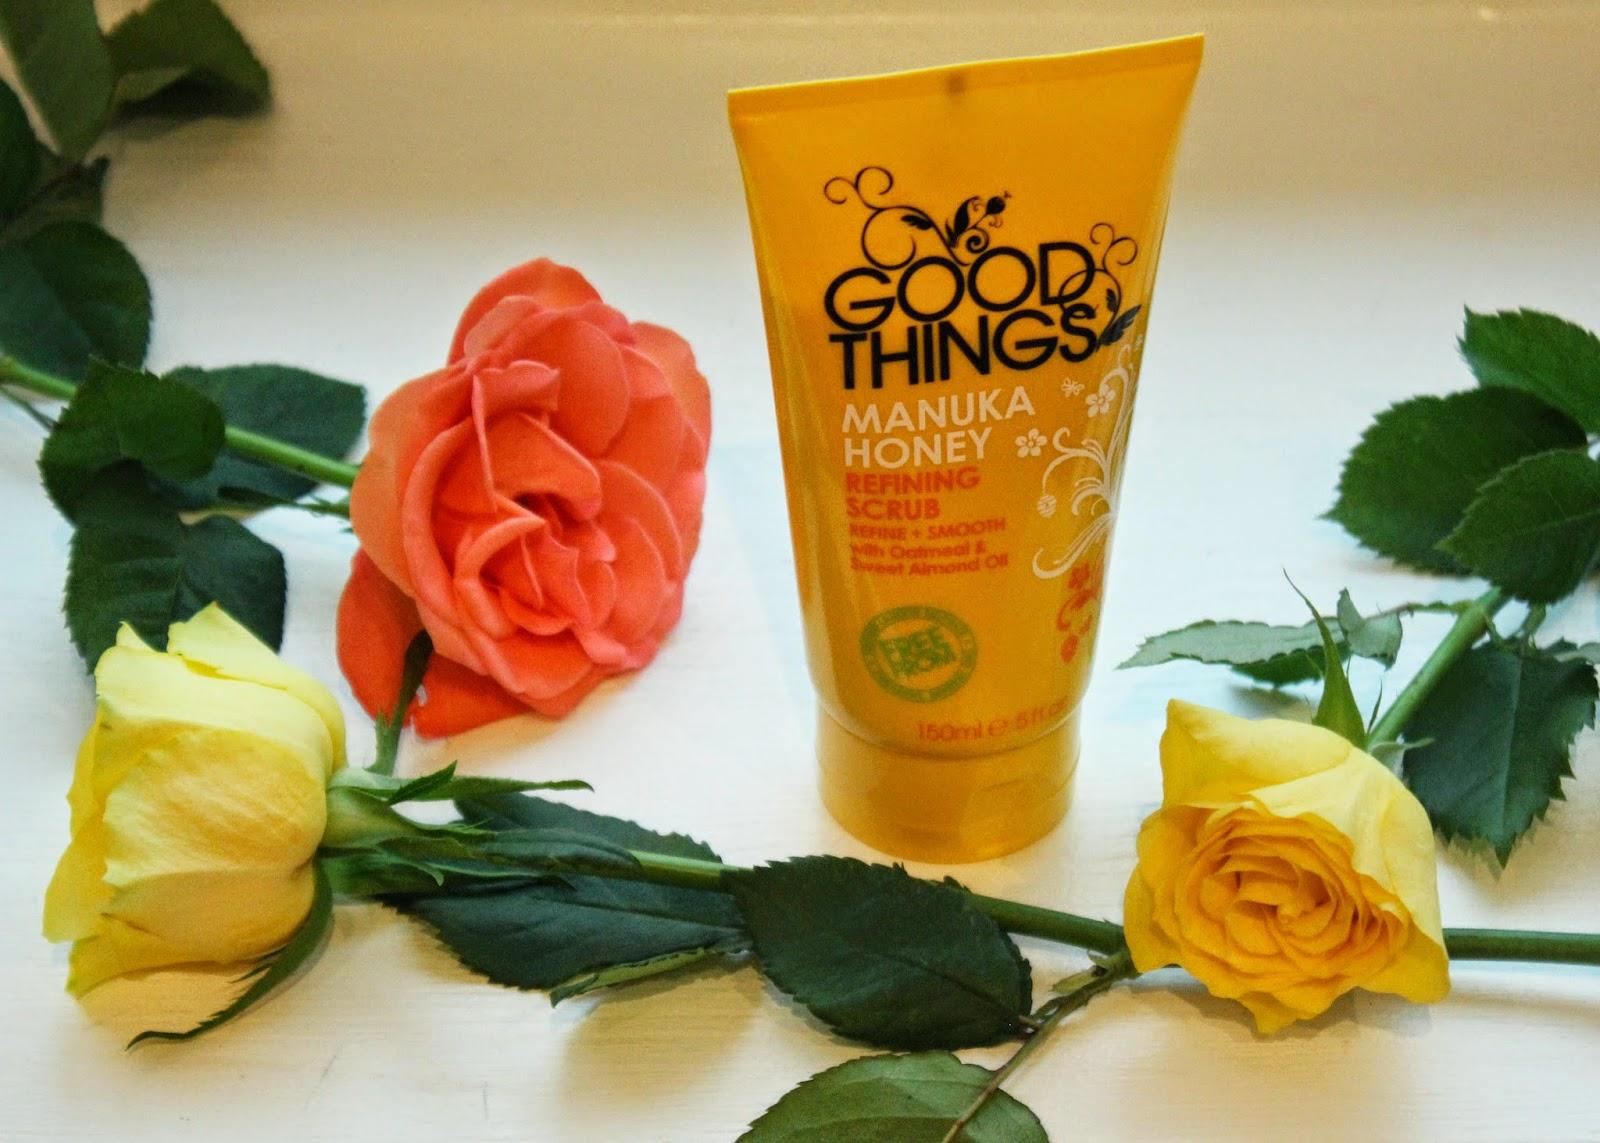 Good Things Manuka Honey Refining Scrub Review